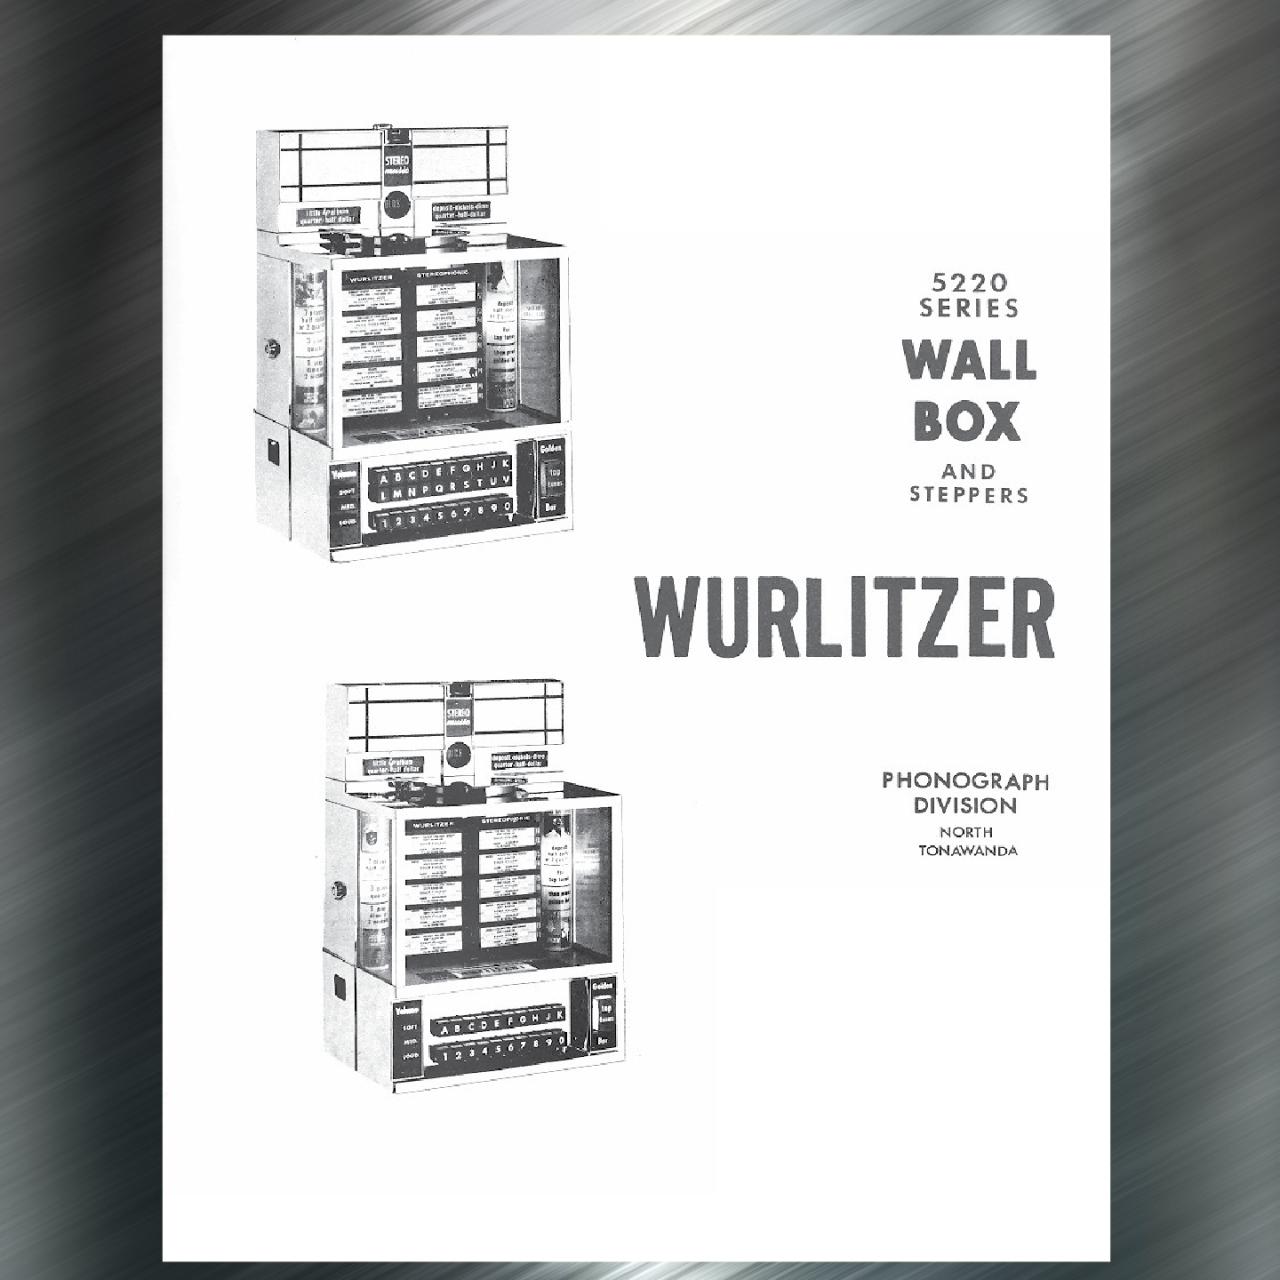 Printed Jukebox Manuals - Jukebox Arcade Wurlitzer 5220 Wall